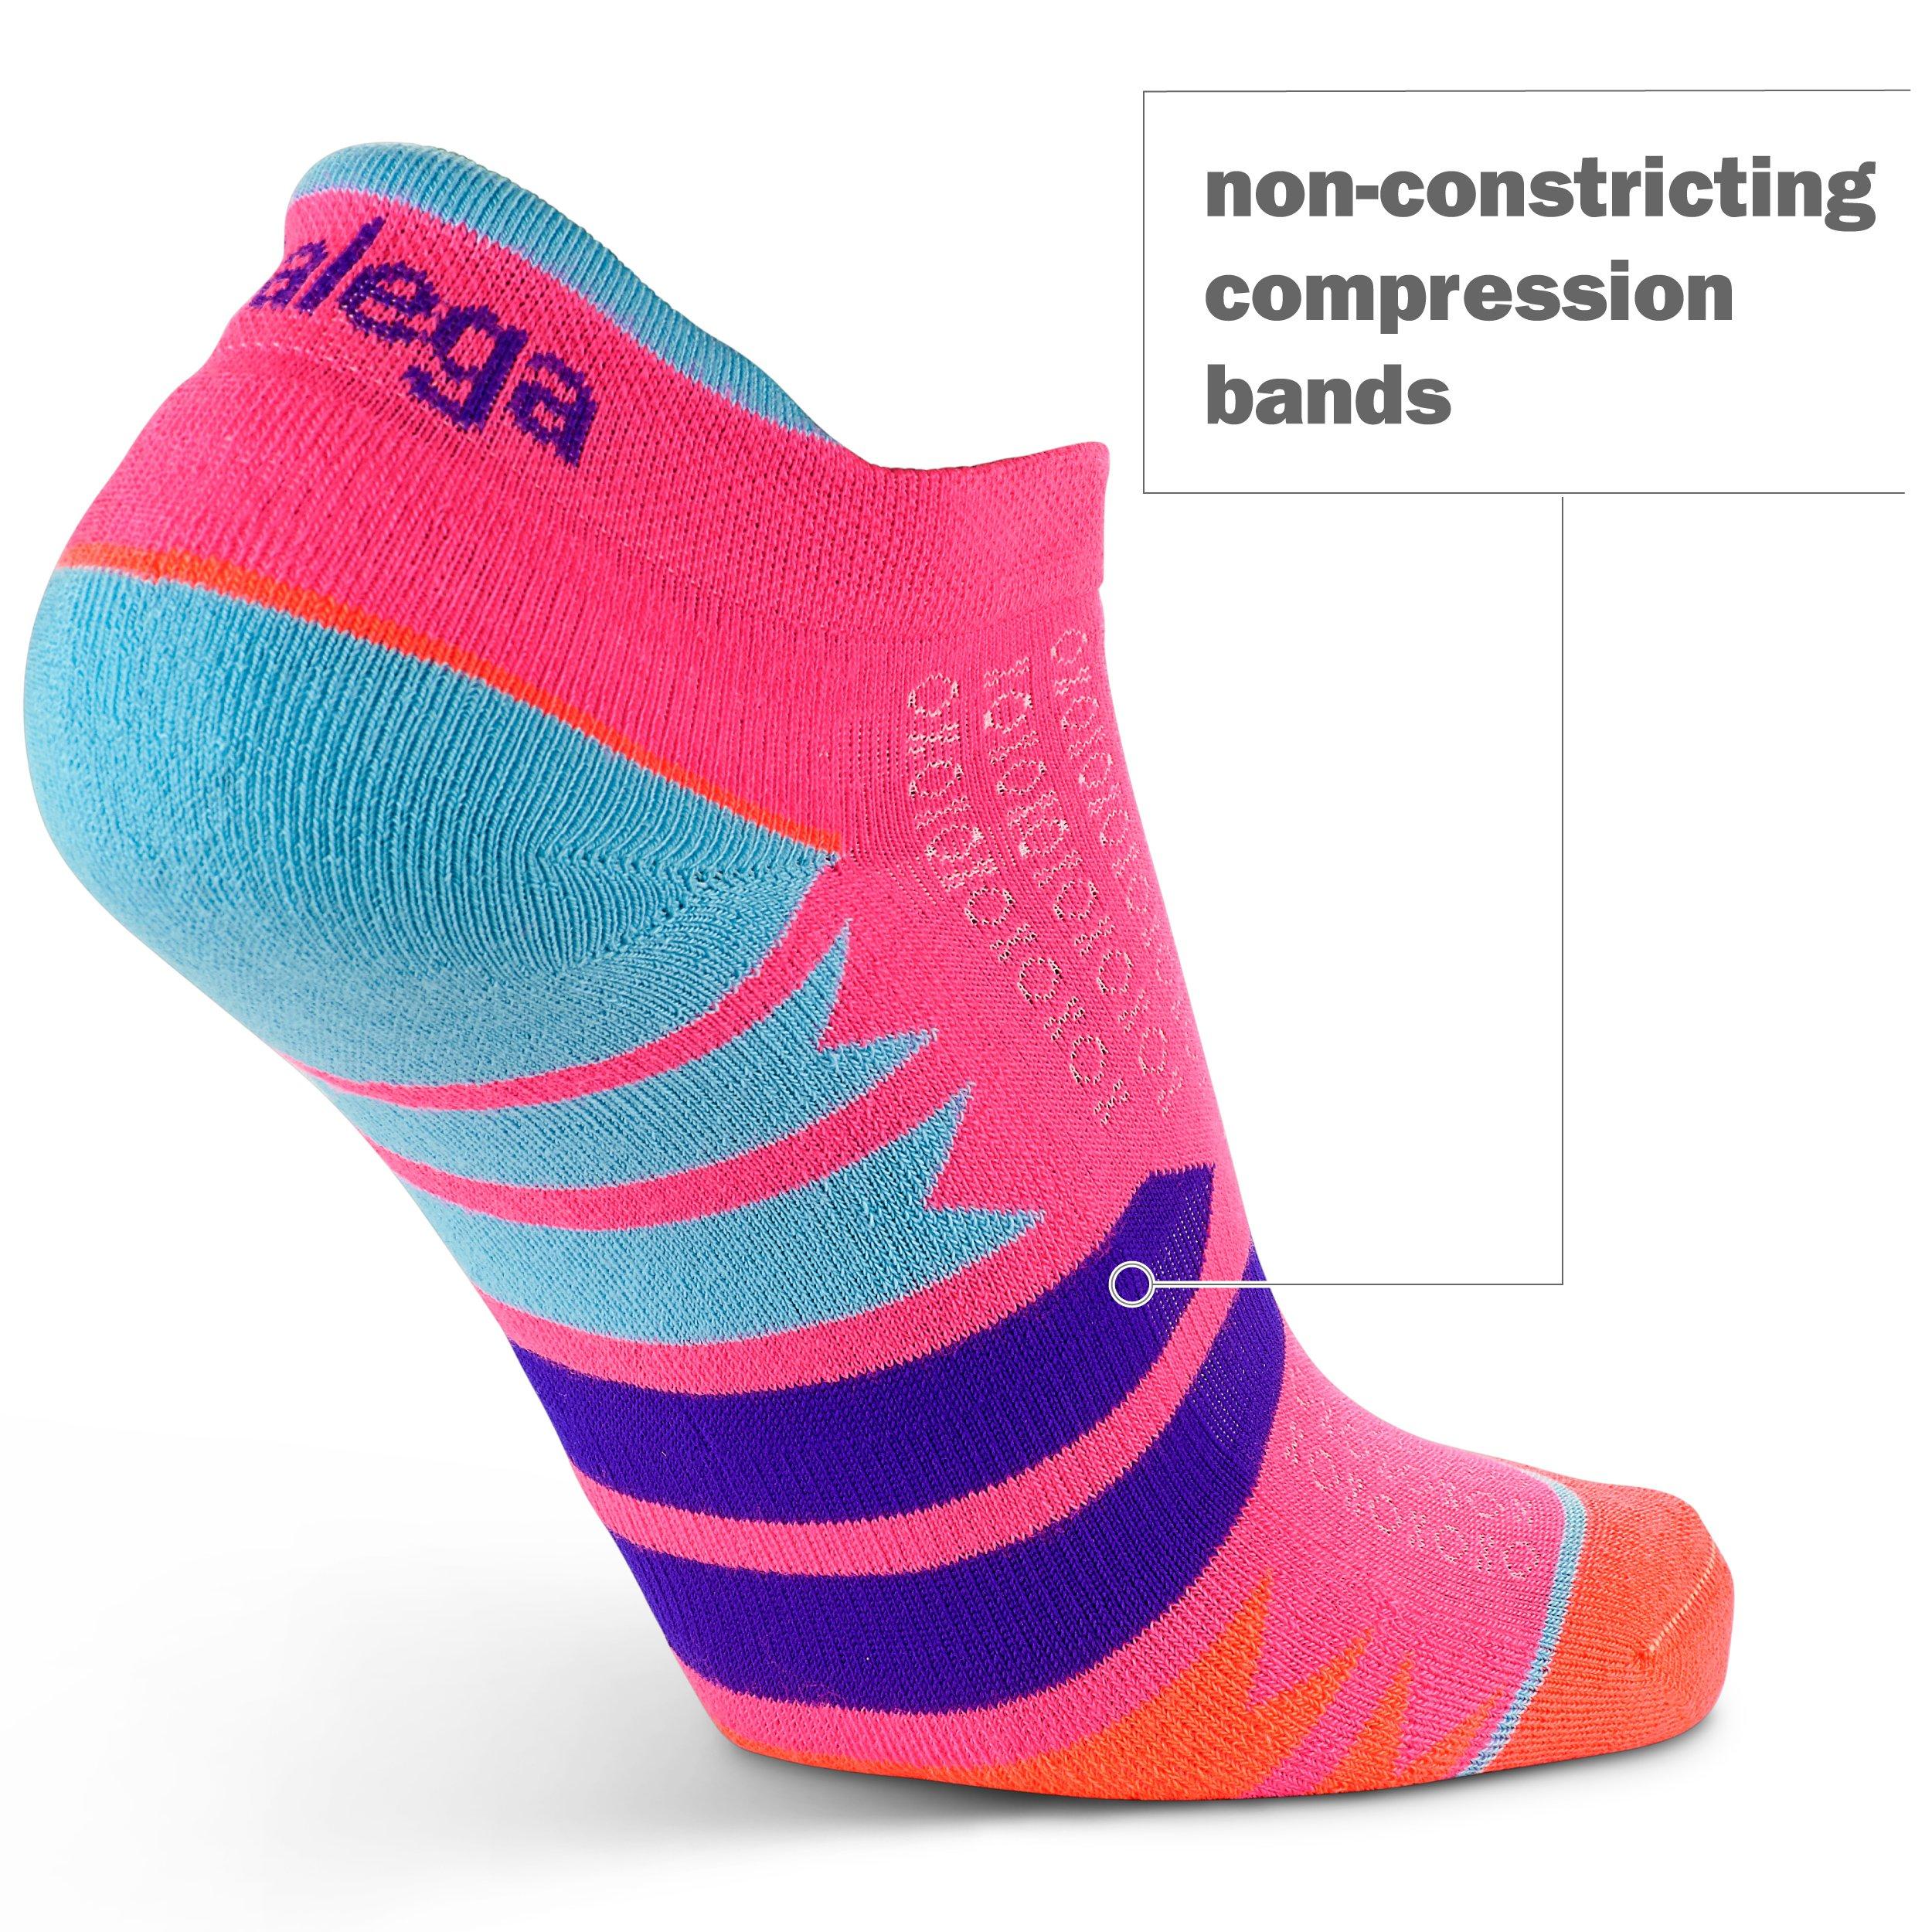 Balega Women's Enduro No Show Socks (1 Pair), Watermelon/Orange, Medium by Balega (Image #6)